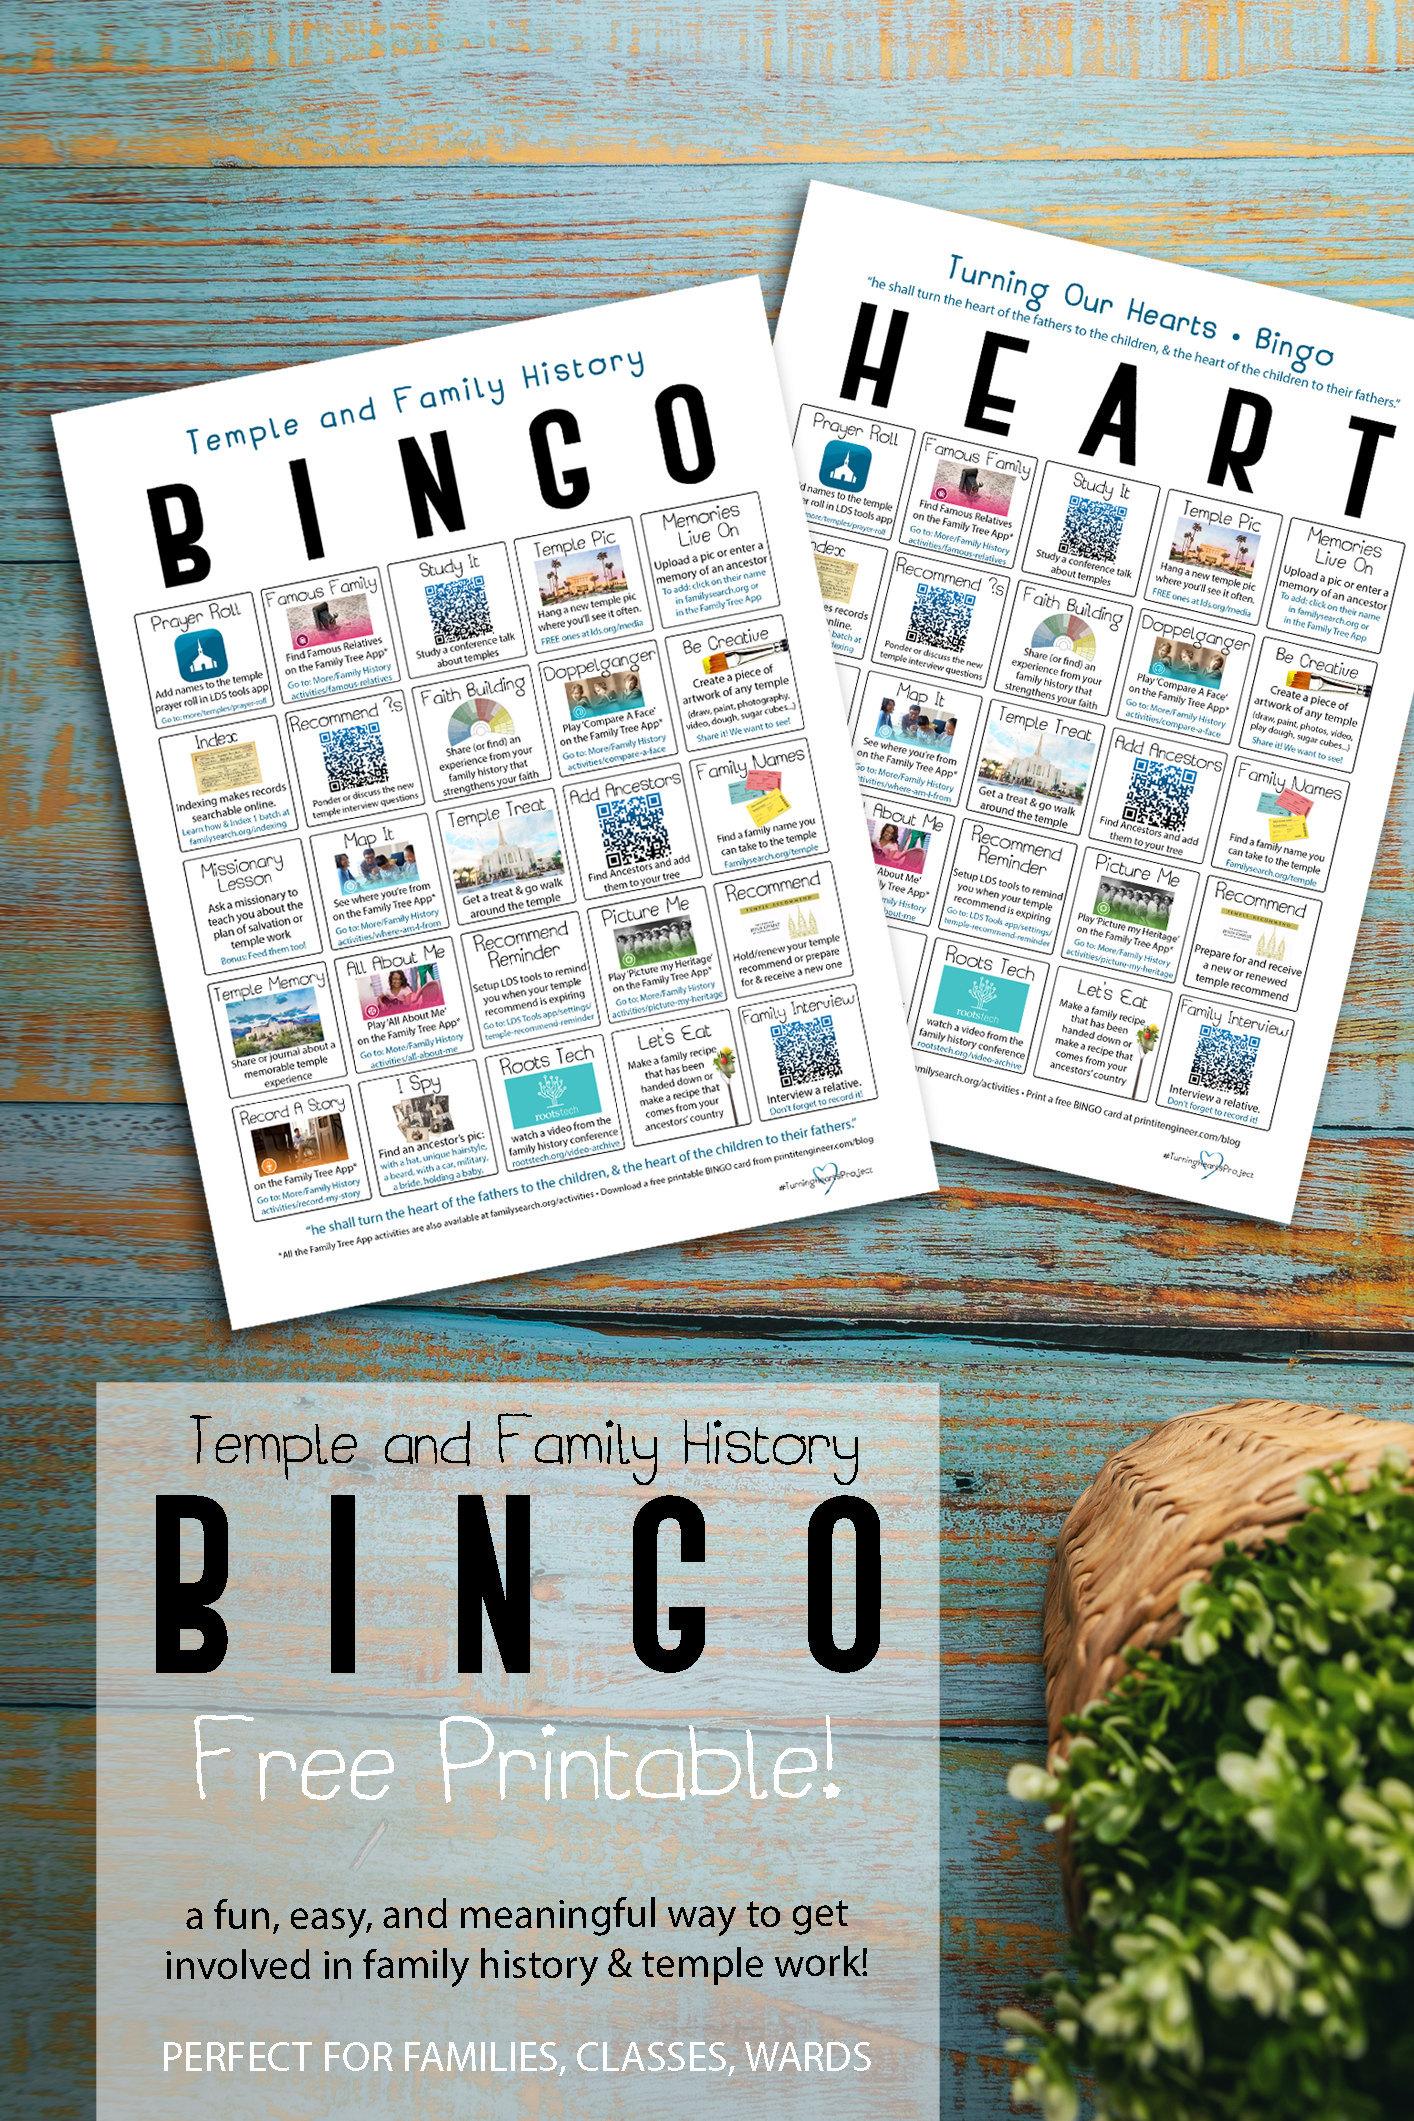 free printable download- Temple Family History Bingo